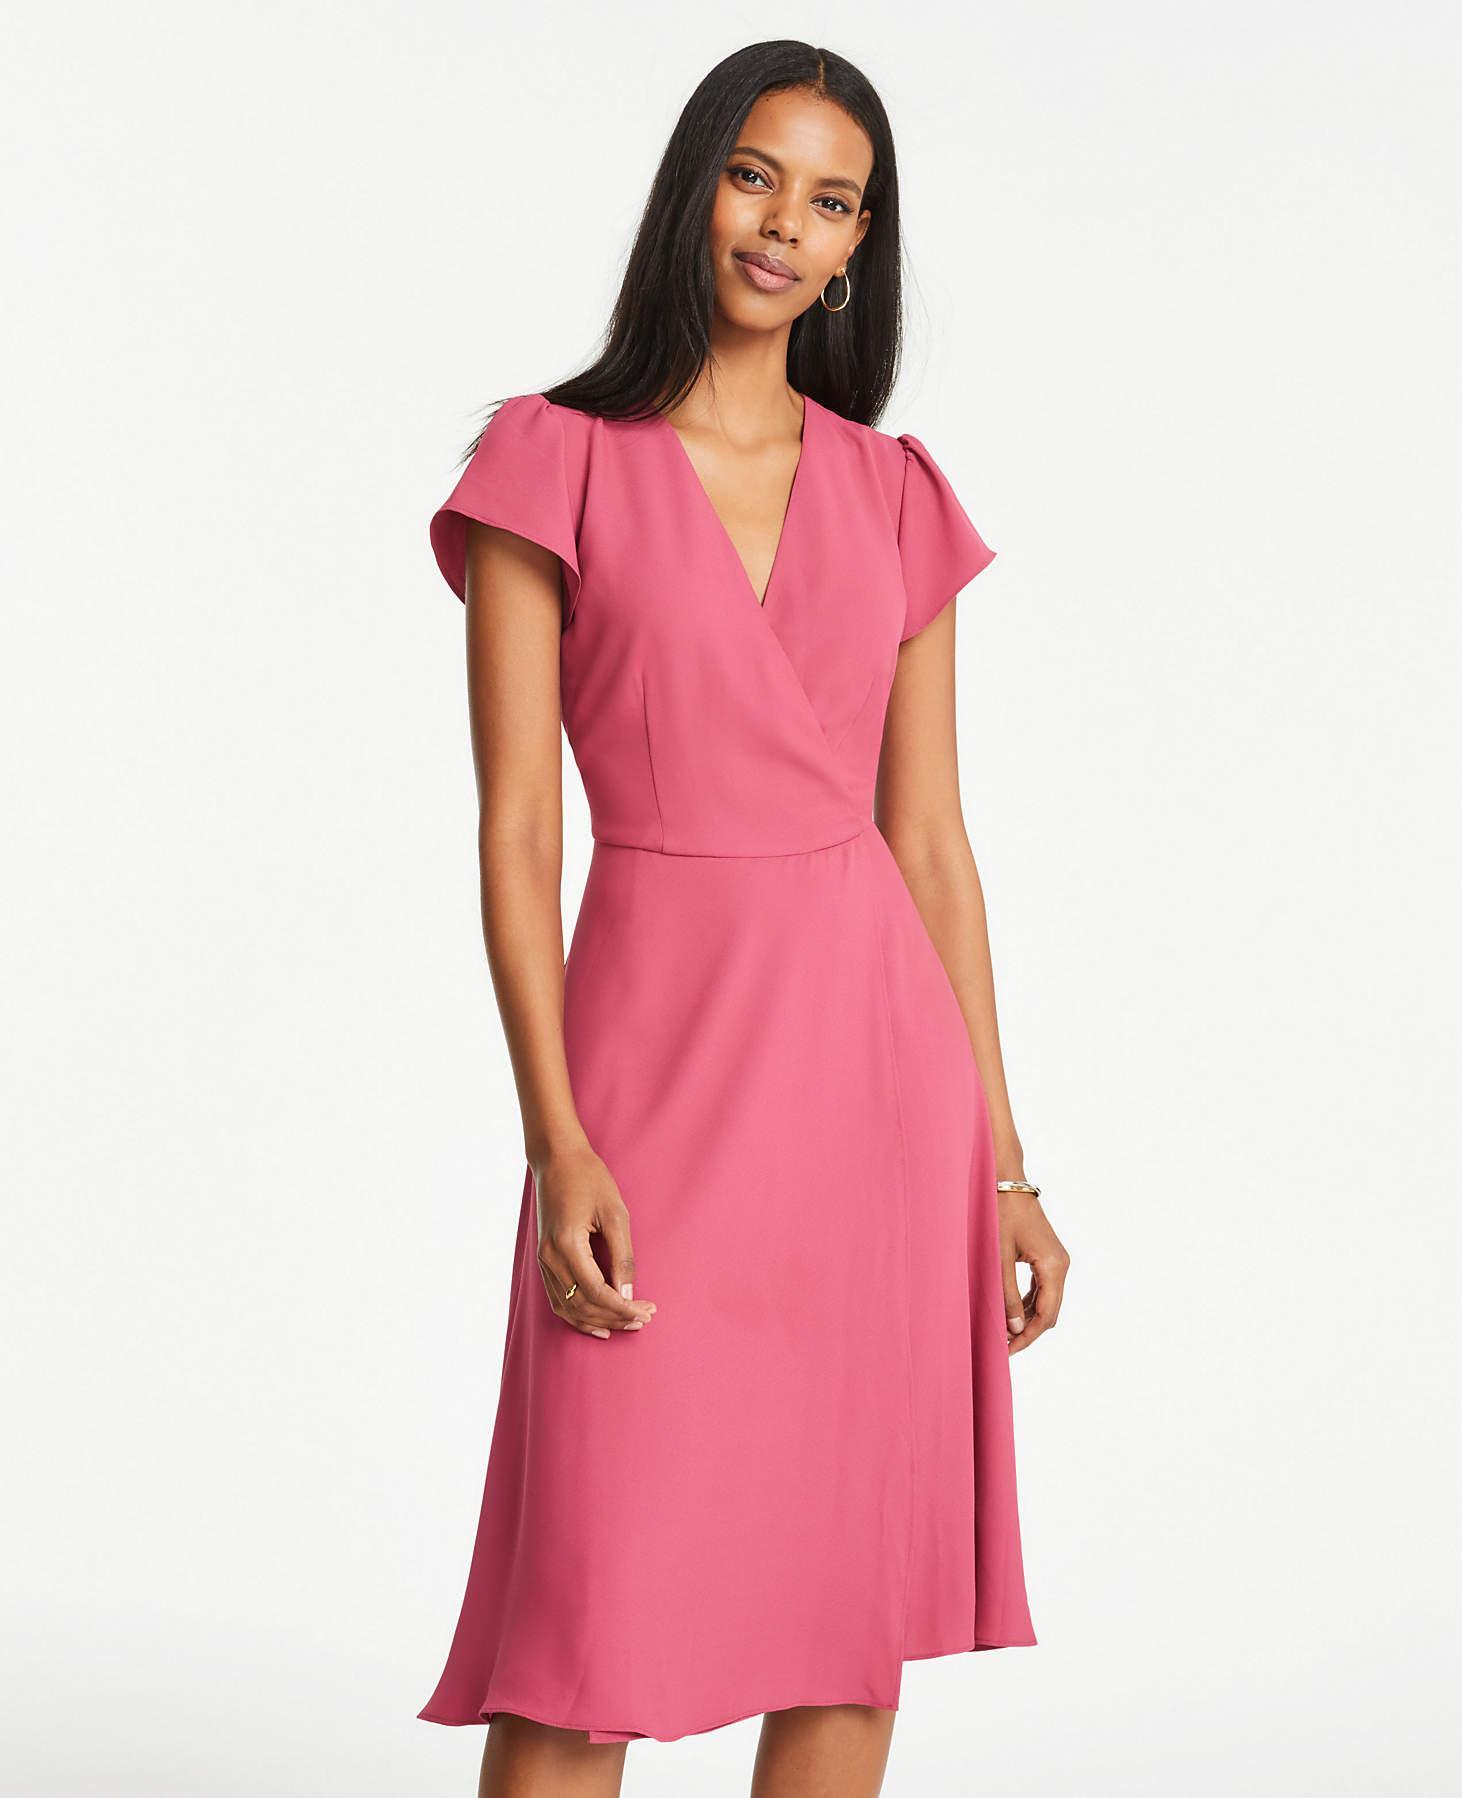 1965a98b5a4 Ann Taylor Petite Flutter Sleeve Wrap Flare Dress in Pink - Lyst